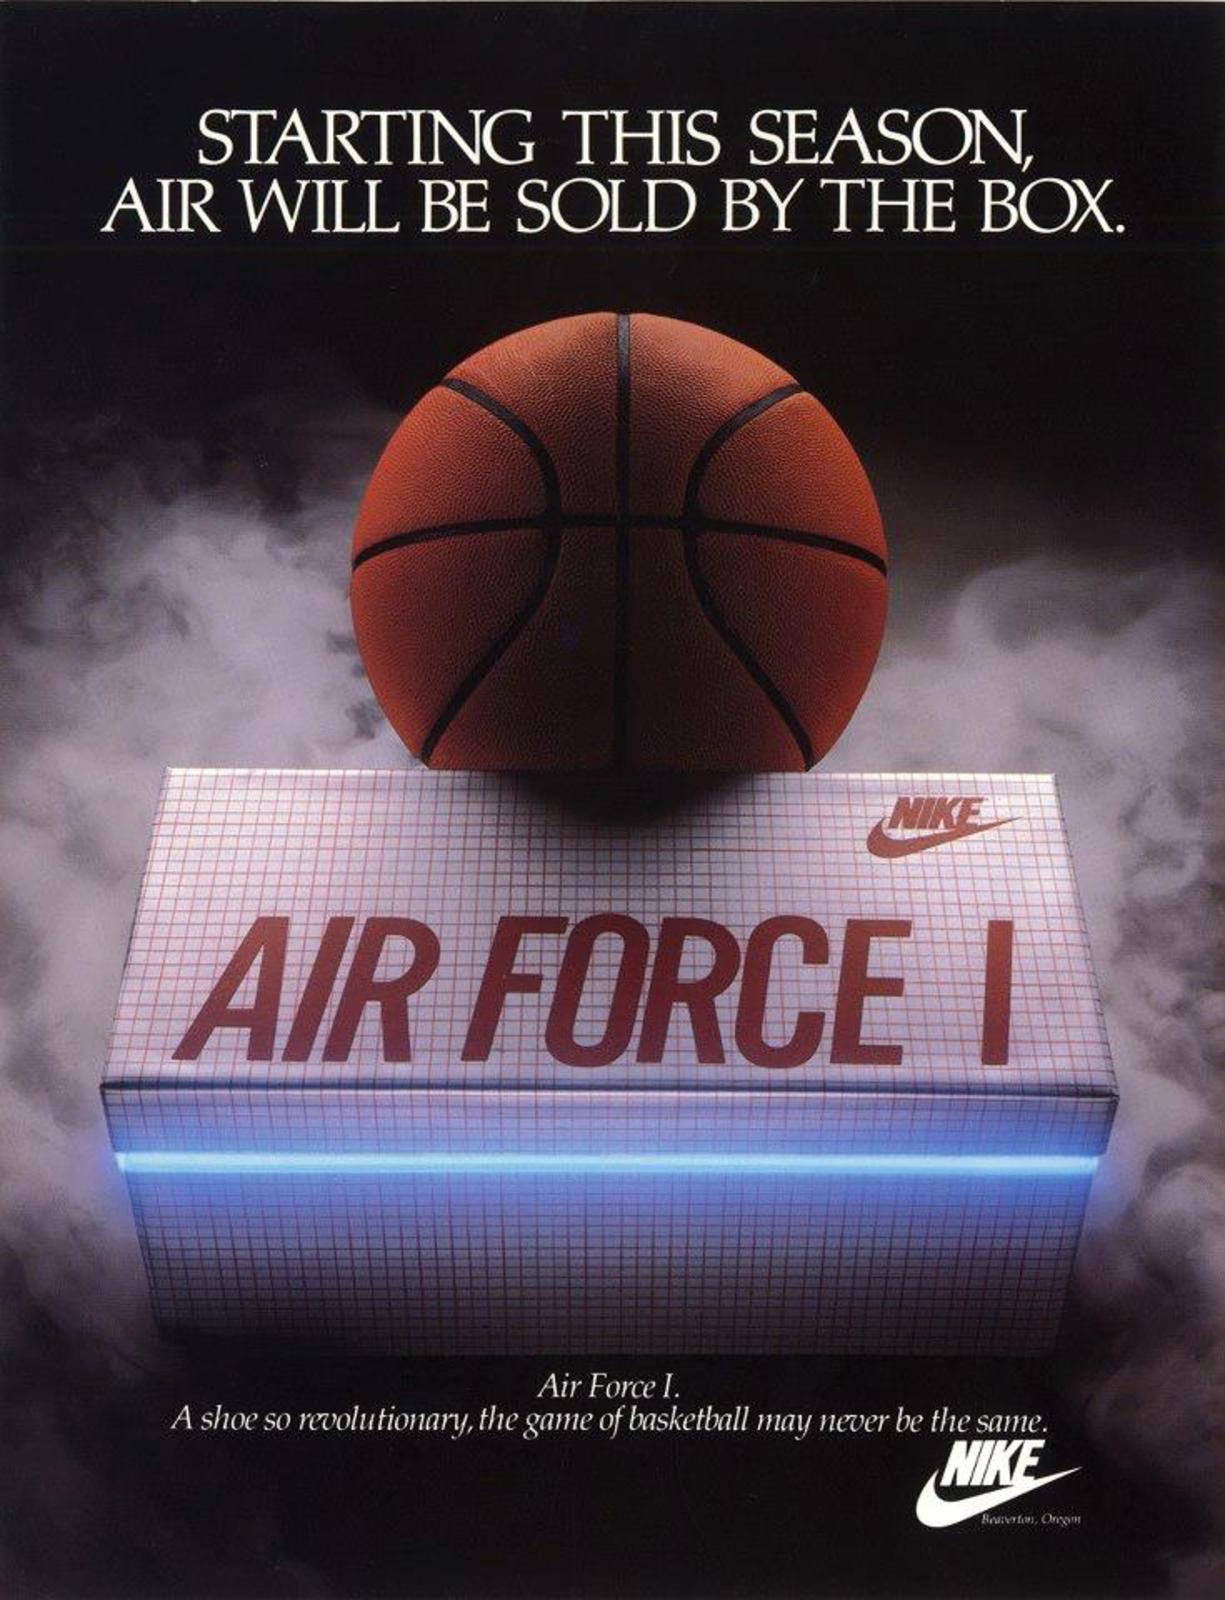 Nike-Air-Force-1-Ad-2